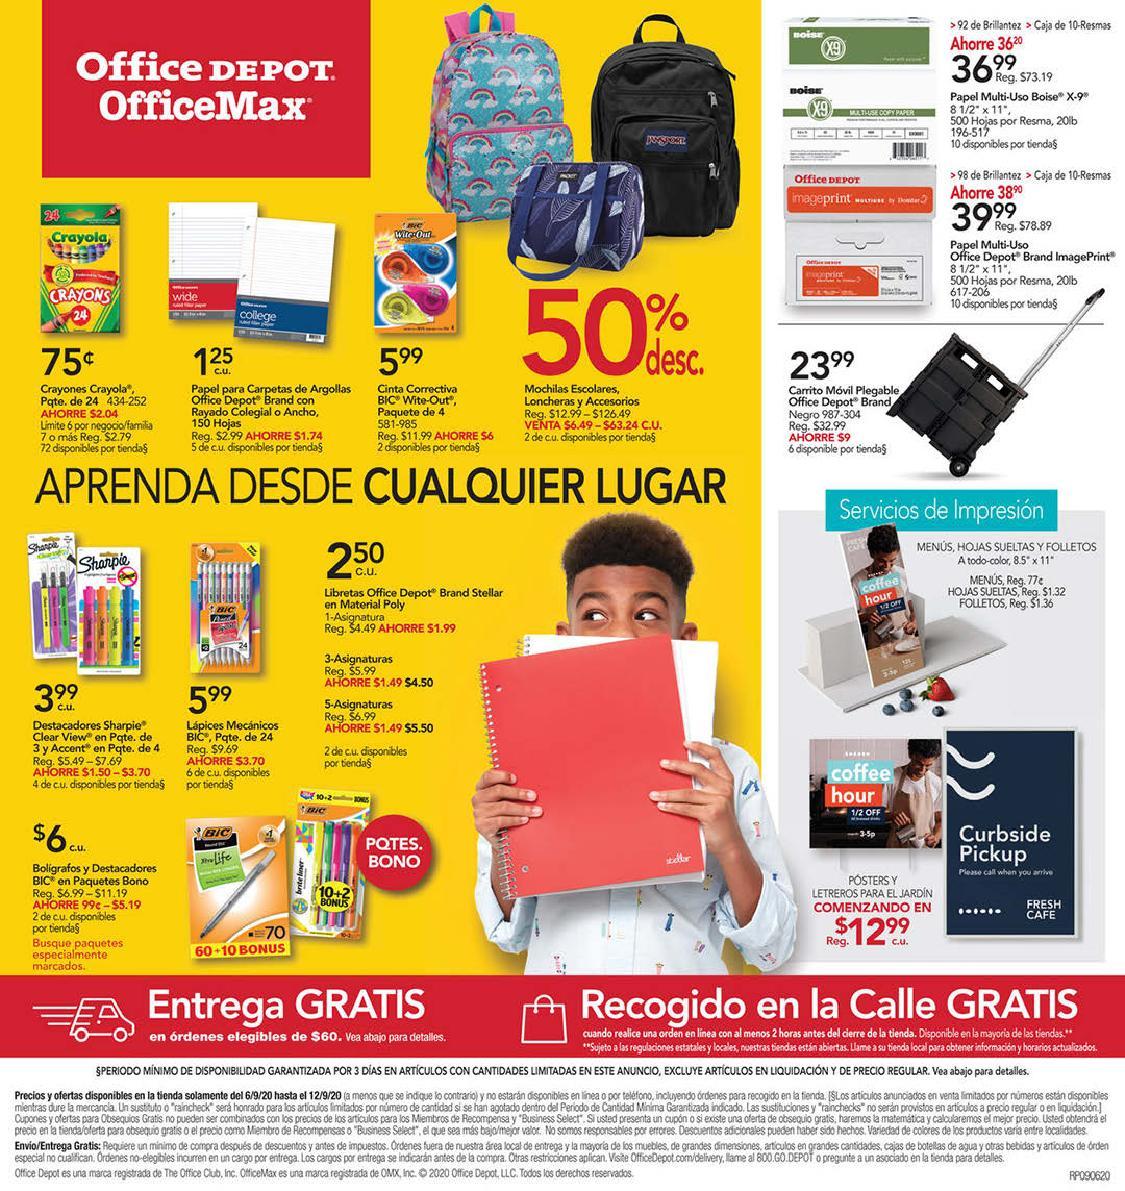 Shopper Office Depot | Office Max 6 de Septiembre al 12 de Septiembre de 2020